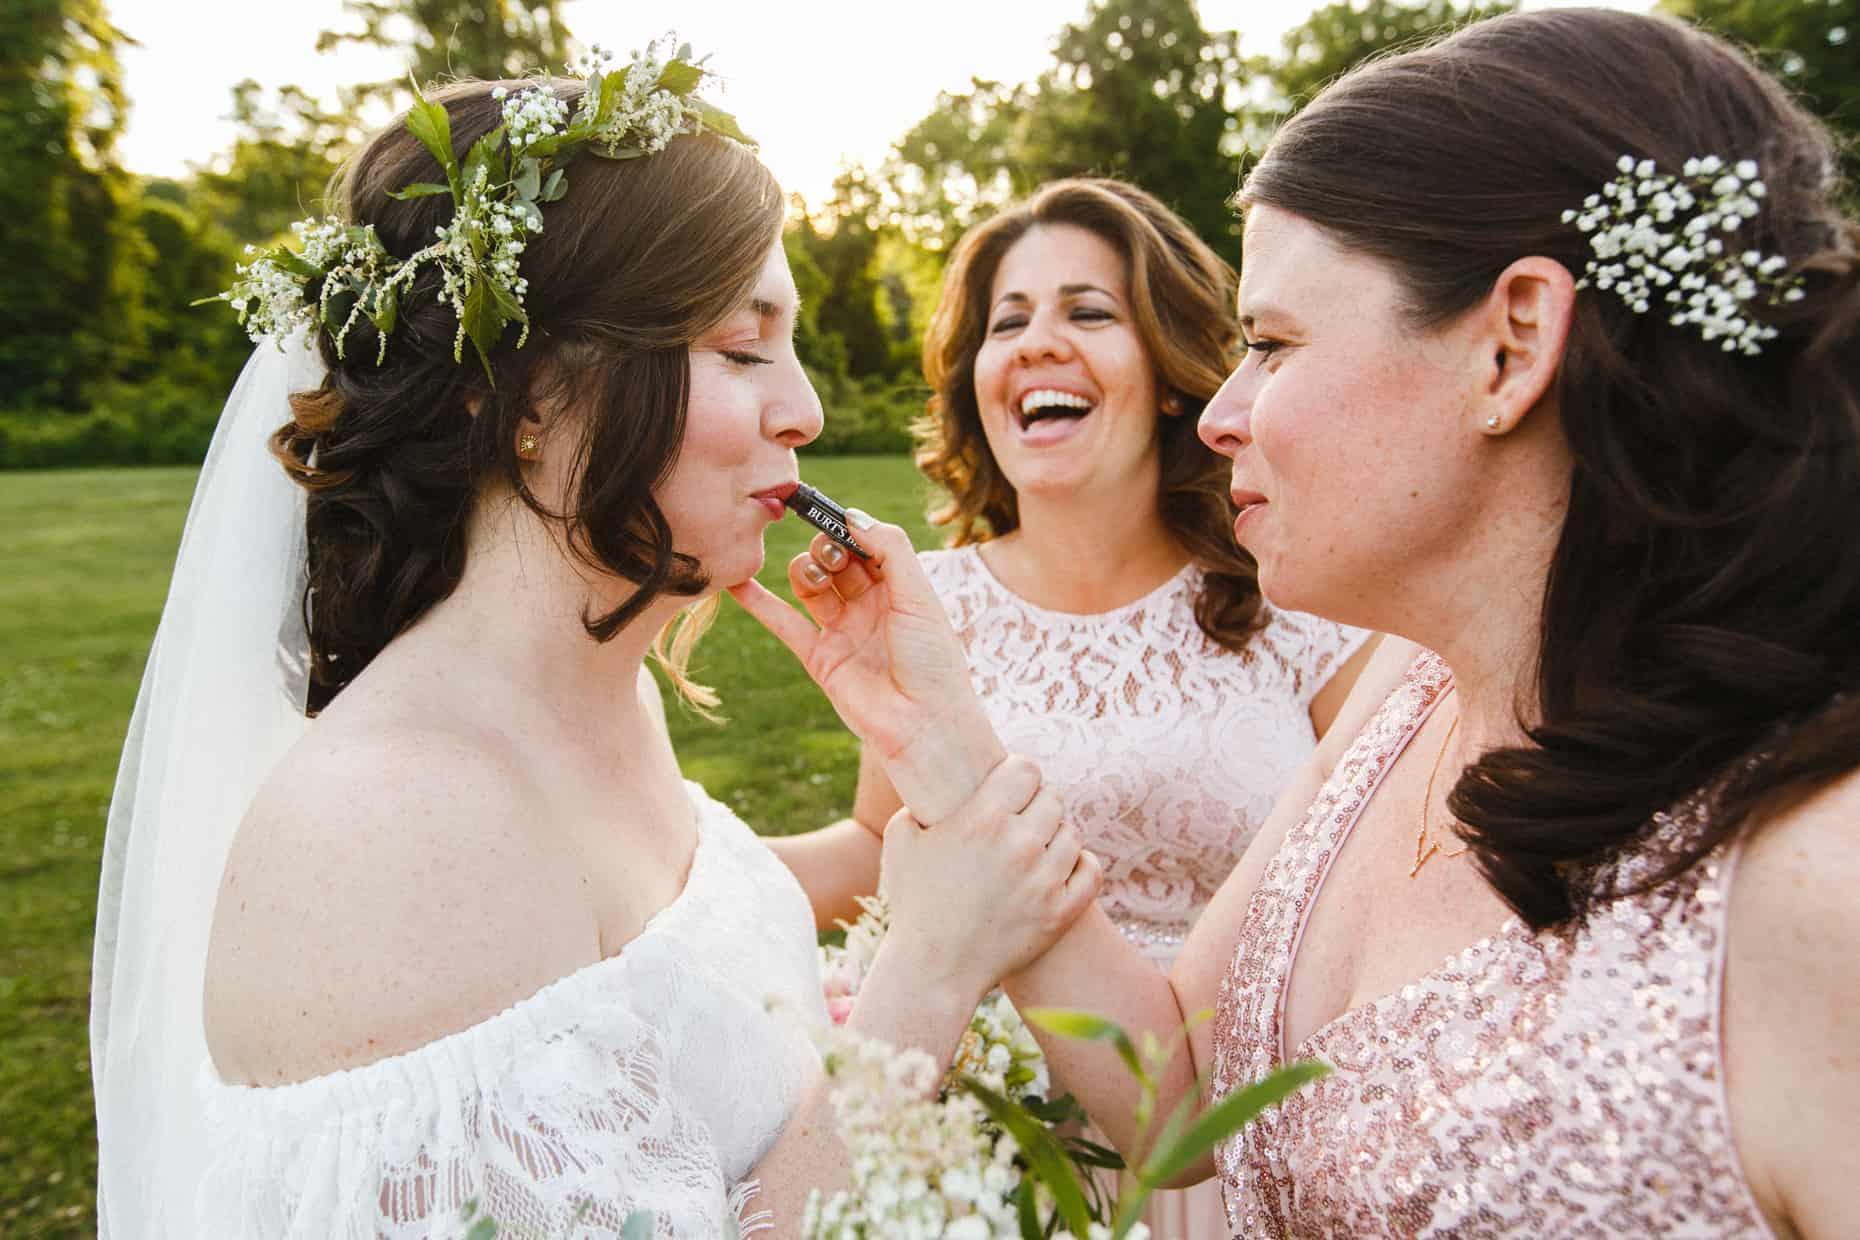 Phoenixville wedding venues